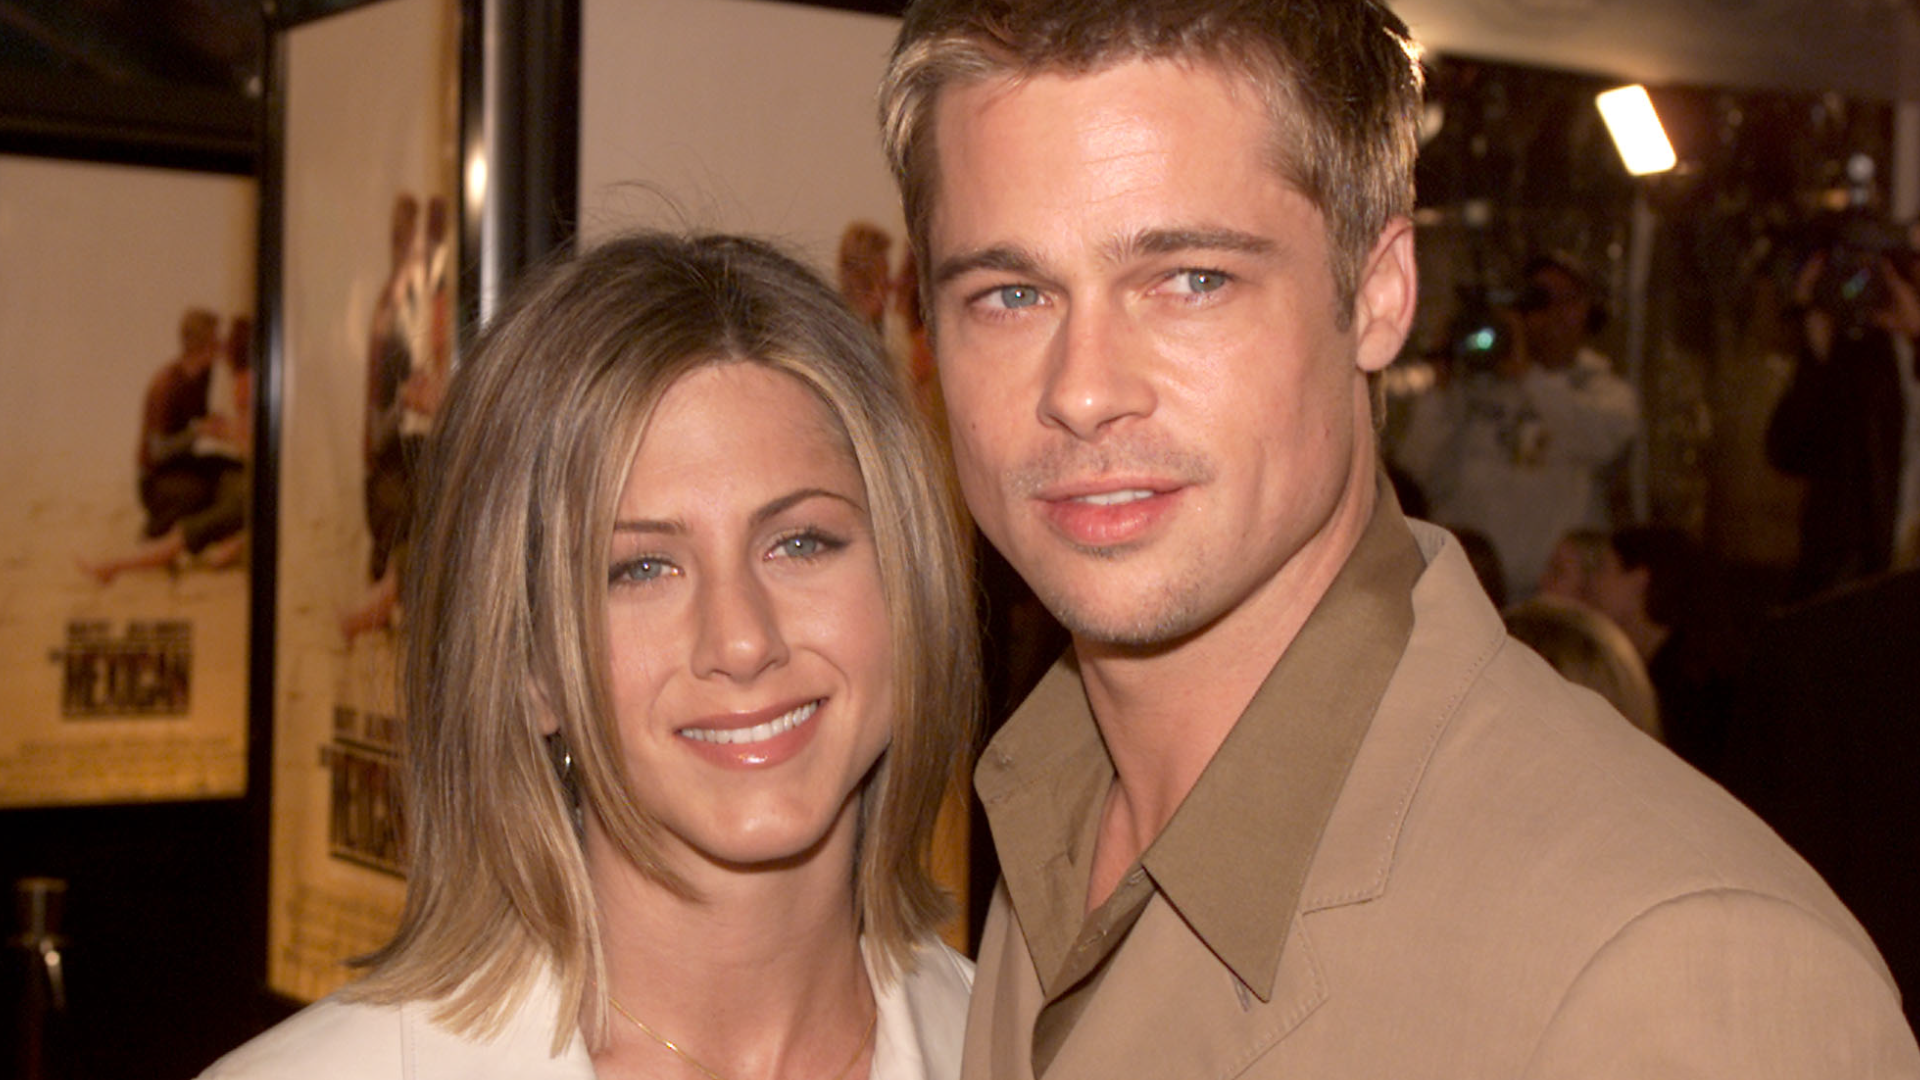 Brad Pitt Just Revealed Leonardo DiCaprio's Nickname for Him, and It's Too Good